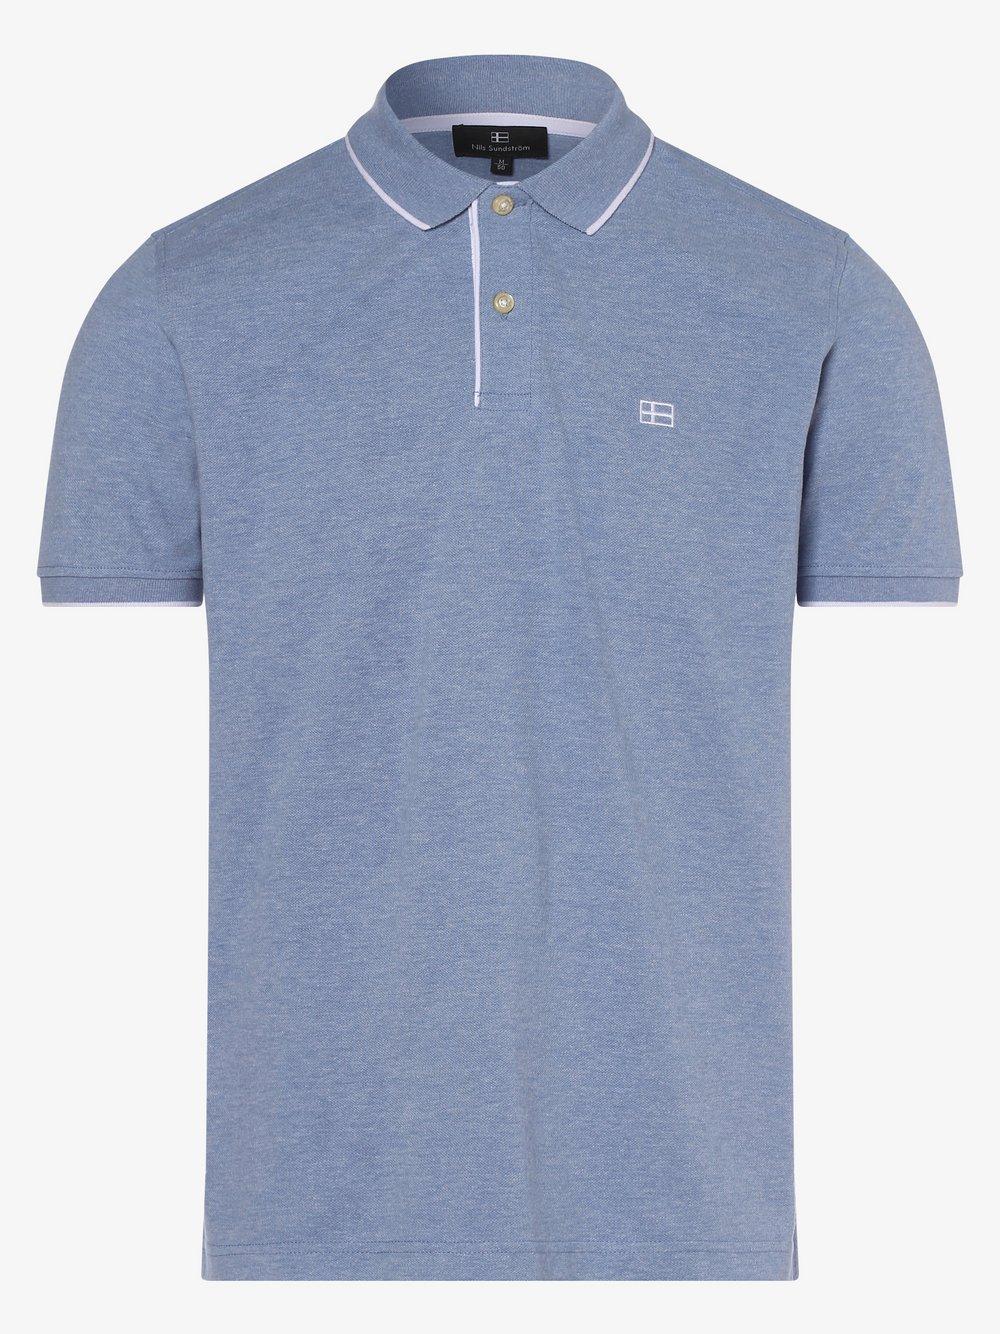 Nils Sundström - Męska koszulka polo, niebieski